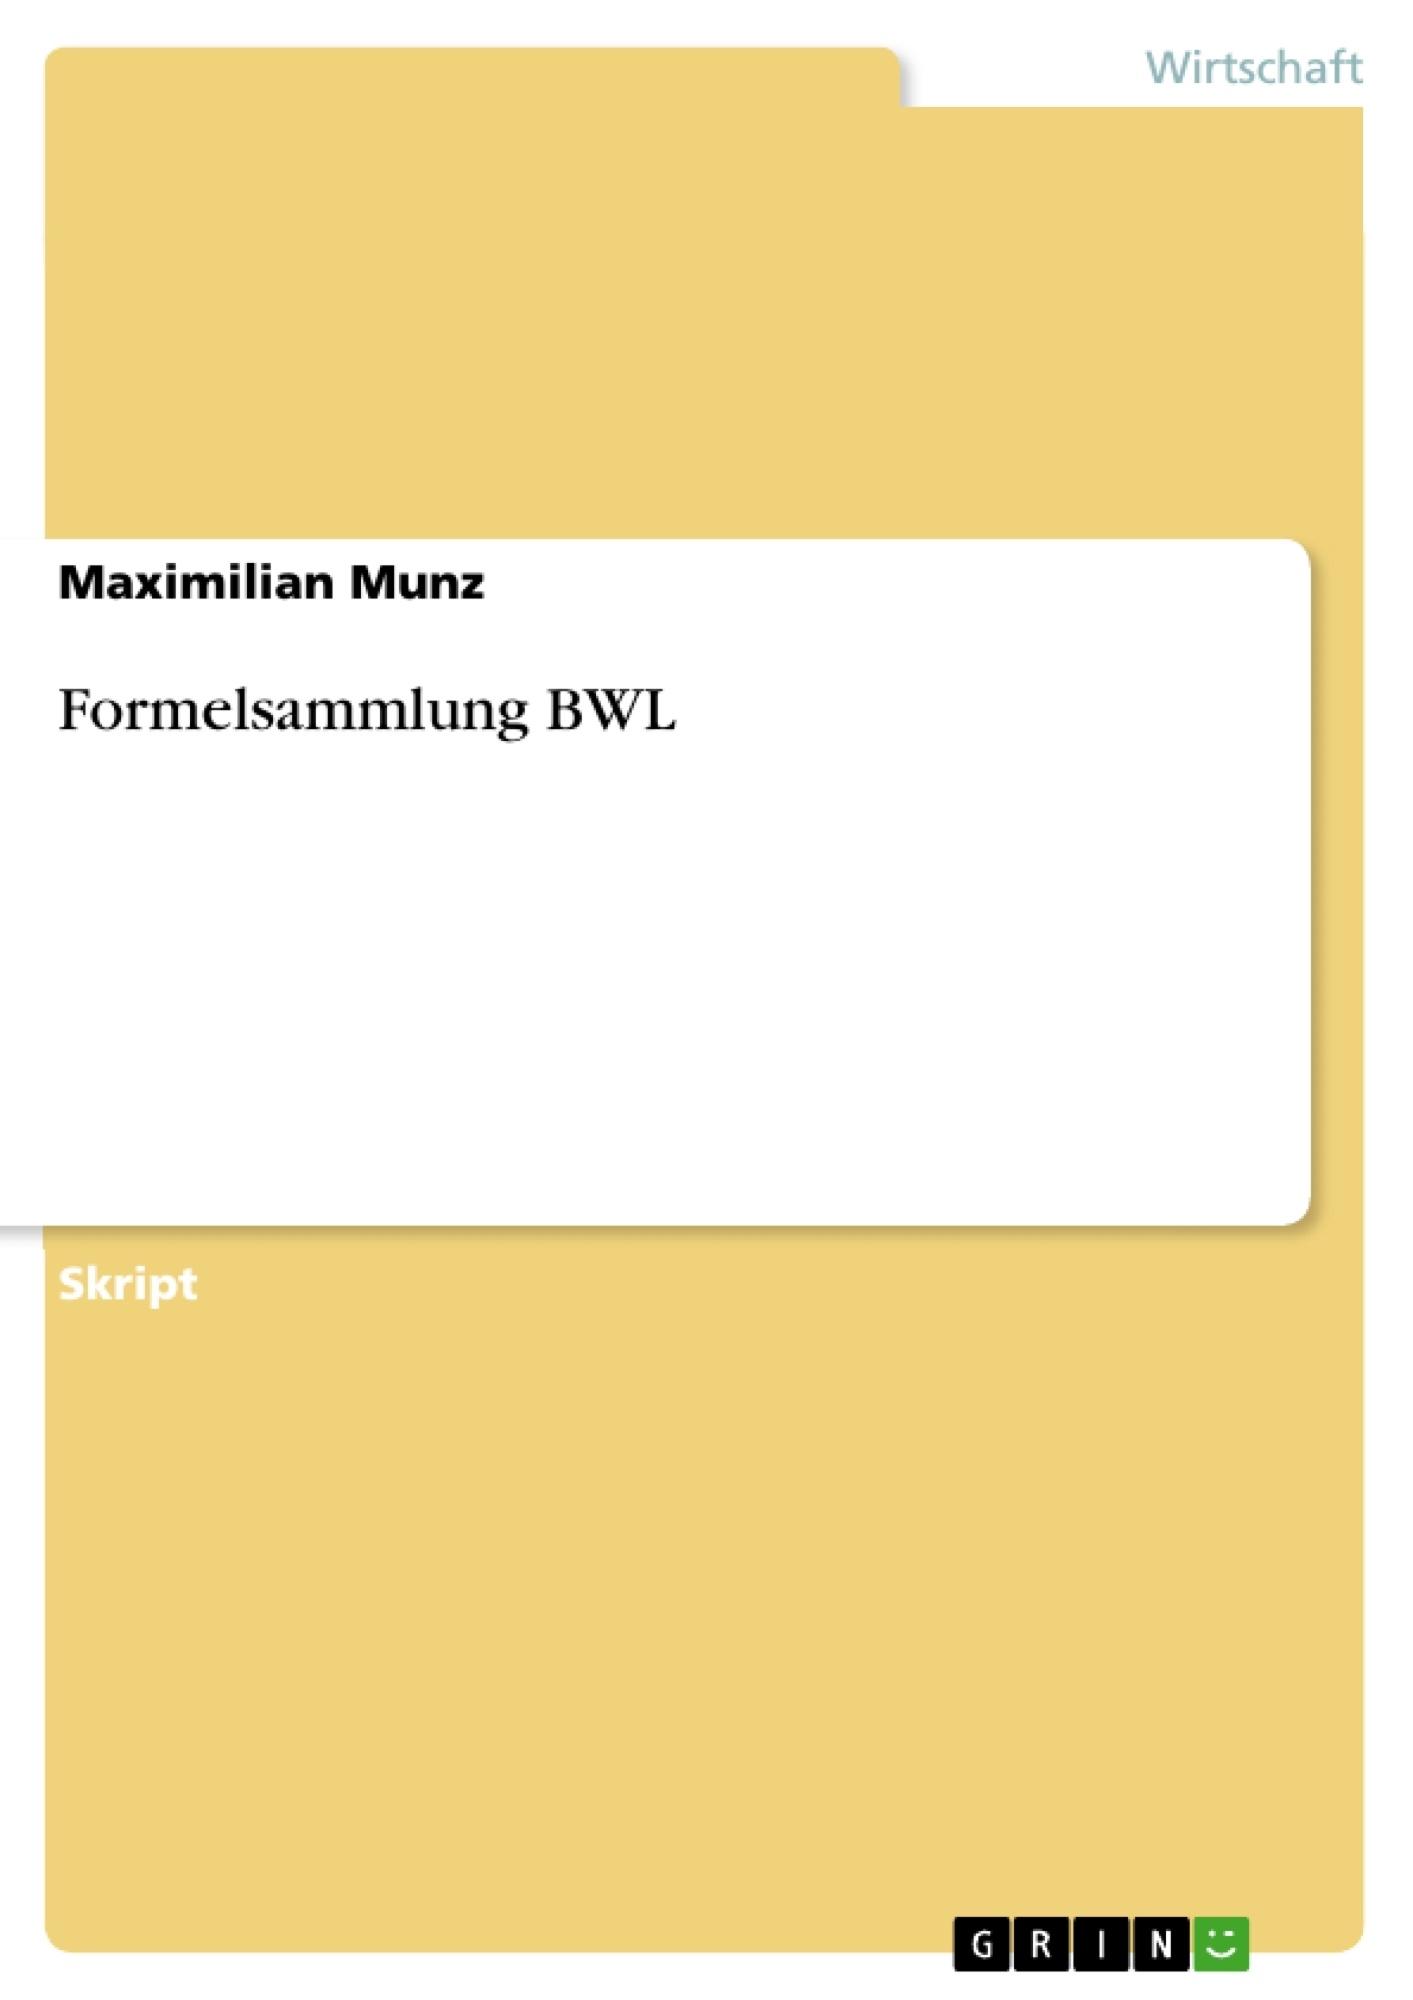 Titel: Formelsammlung BWL